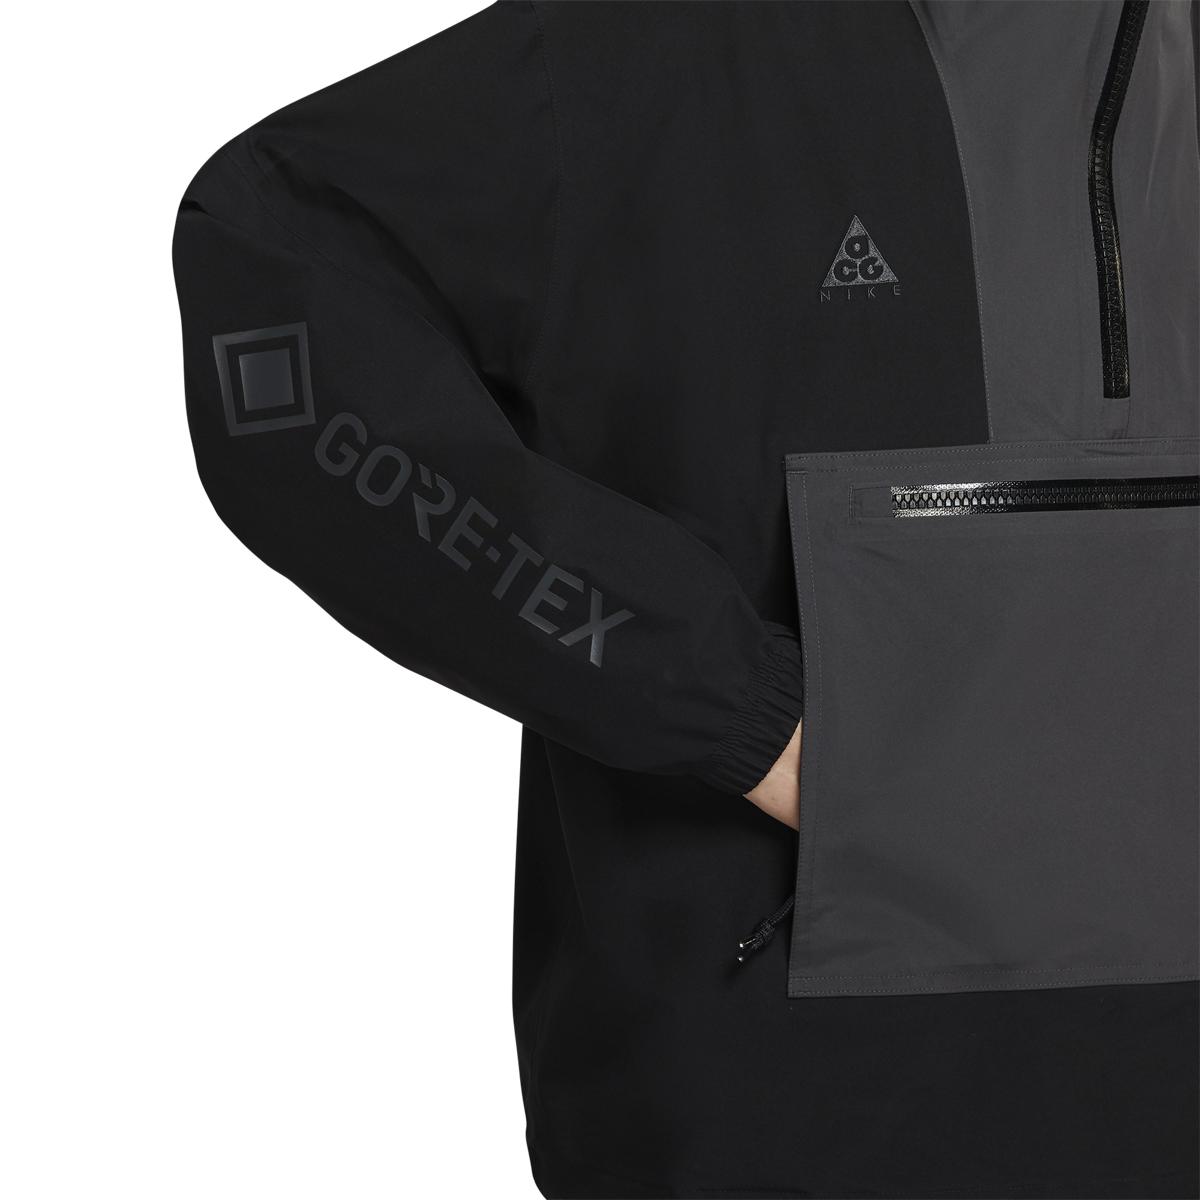 Nike ACG GORE-TEX Paclite Jacket